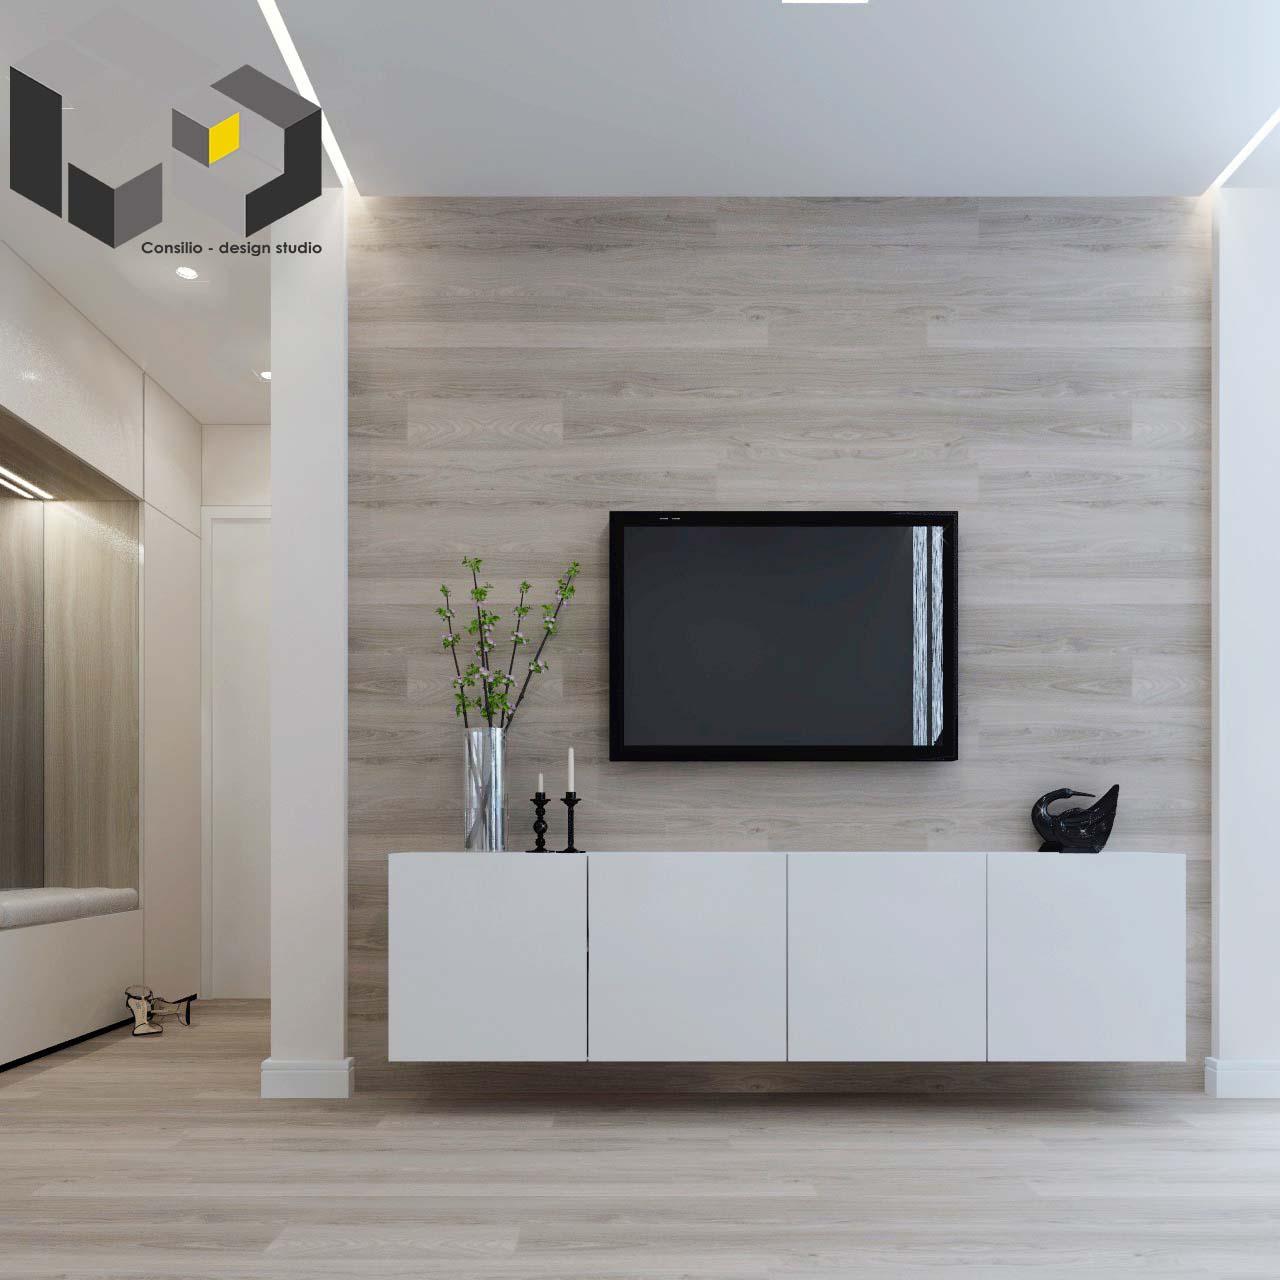 kitchen-living room6